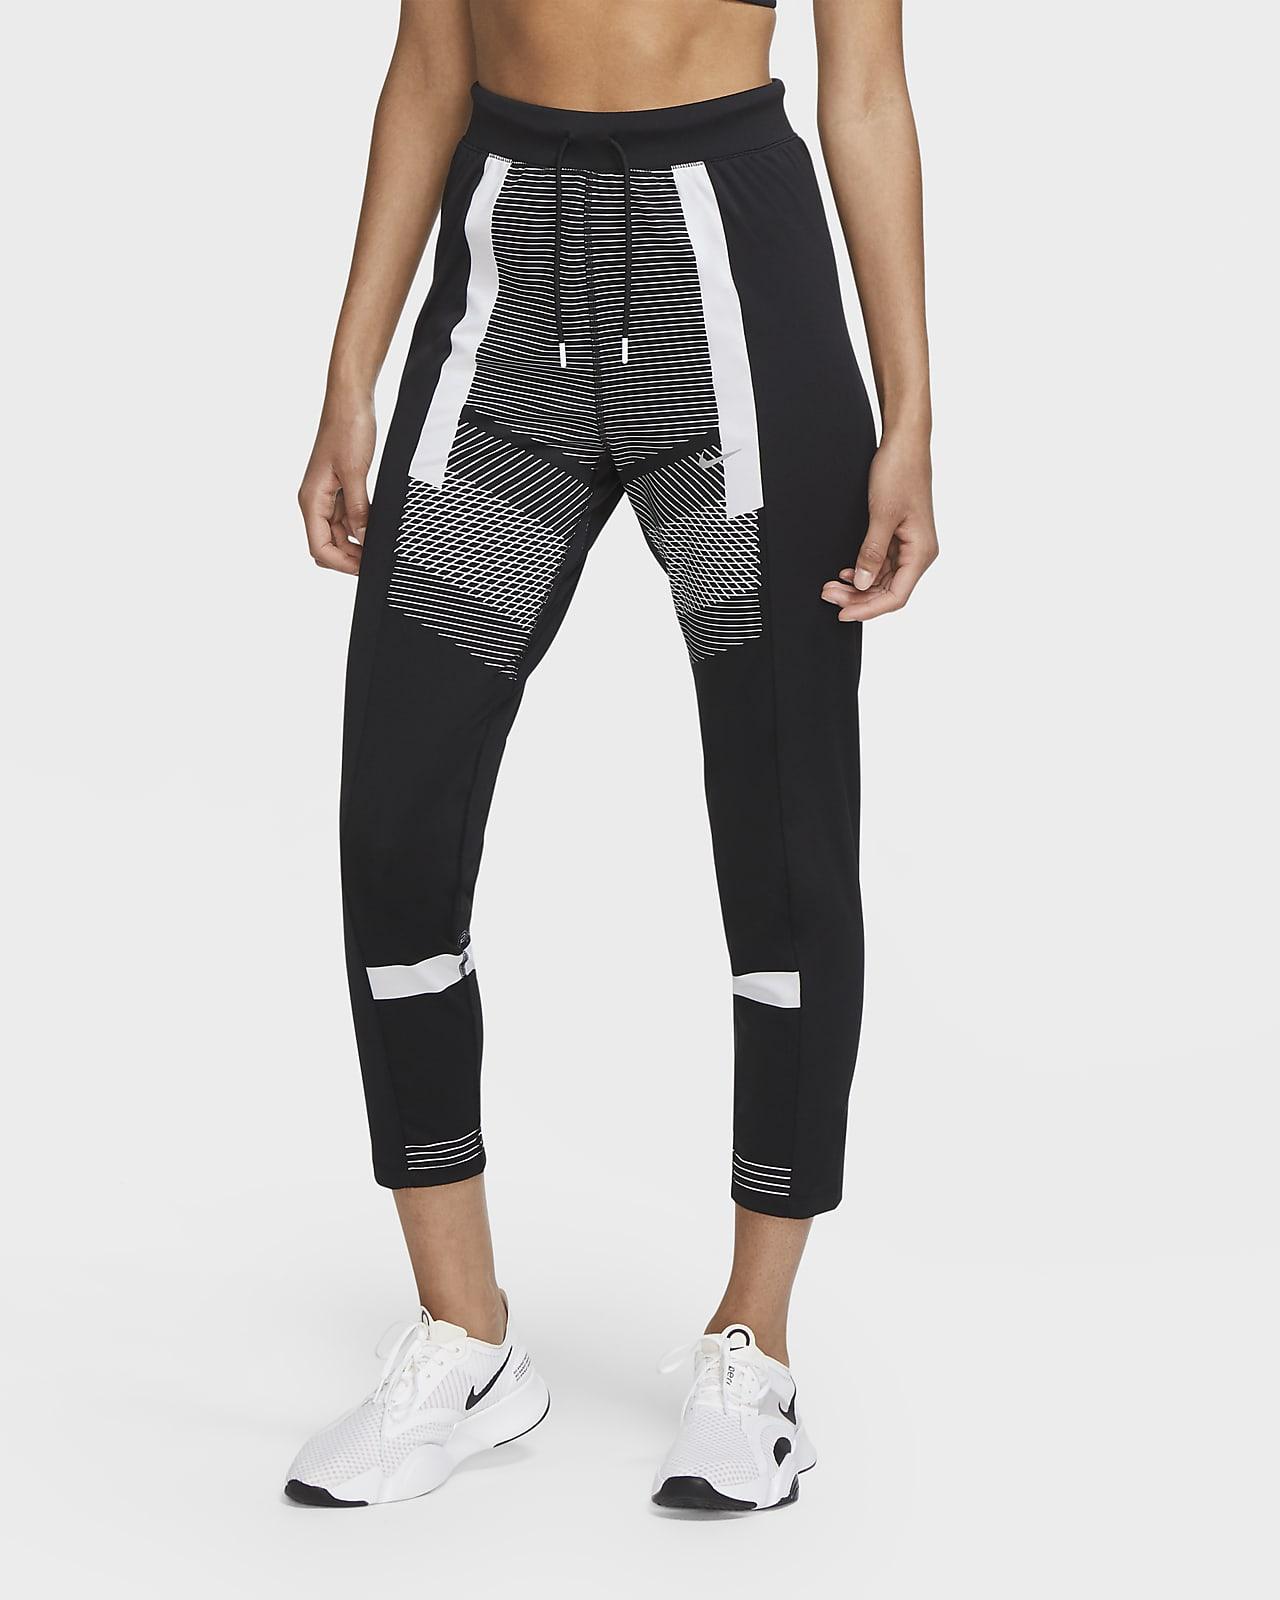 Nike Pro Women's Knit Pants